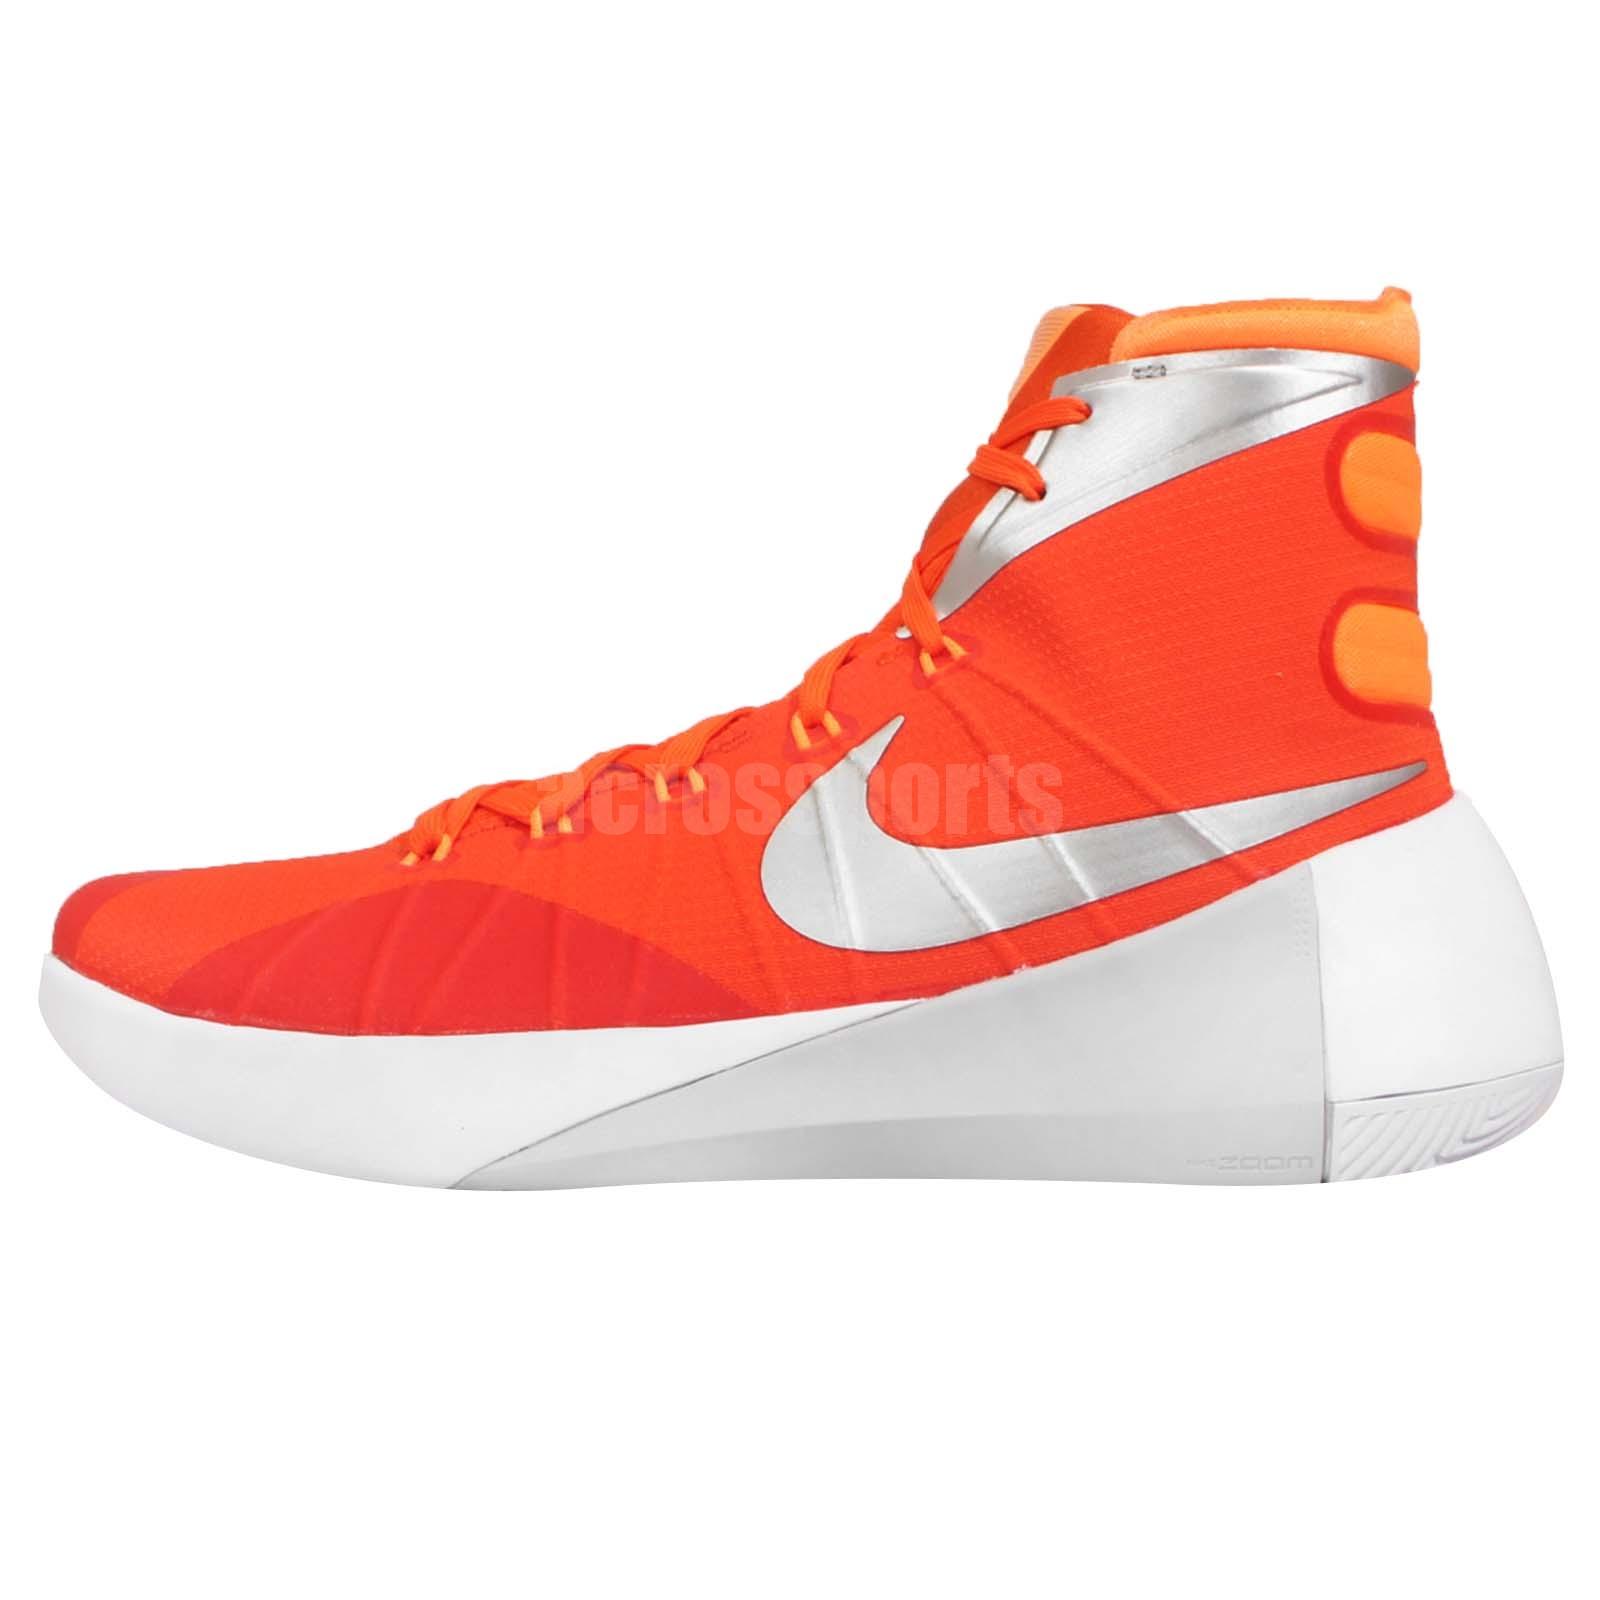 Hyperdunk  Tb Basketball Shoes Orange Amazon